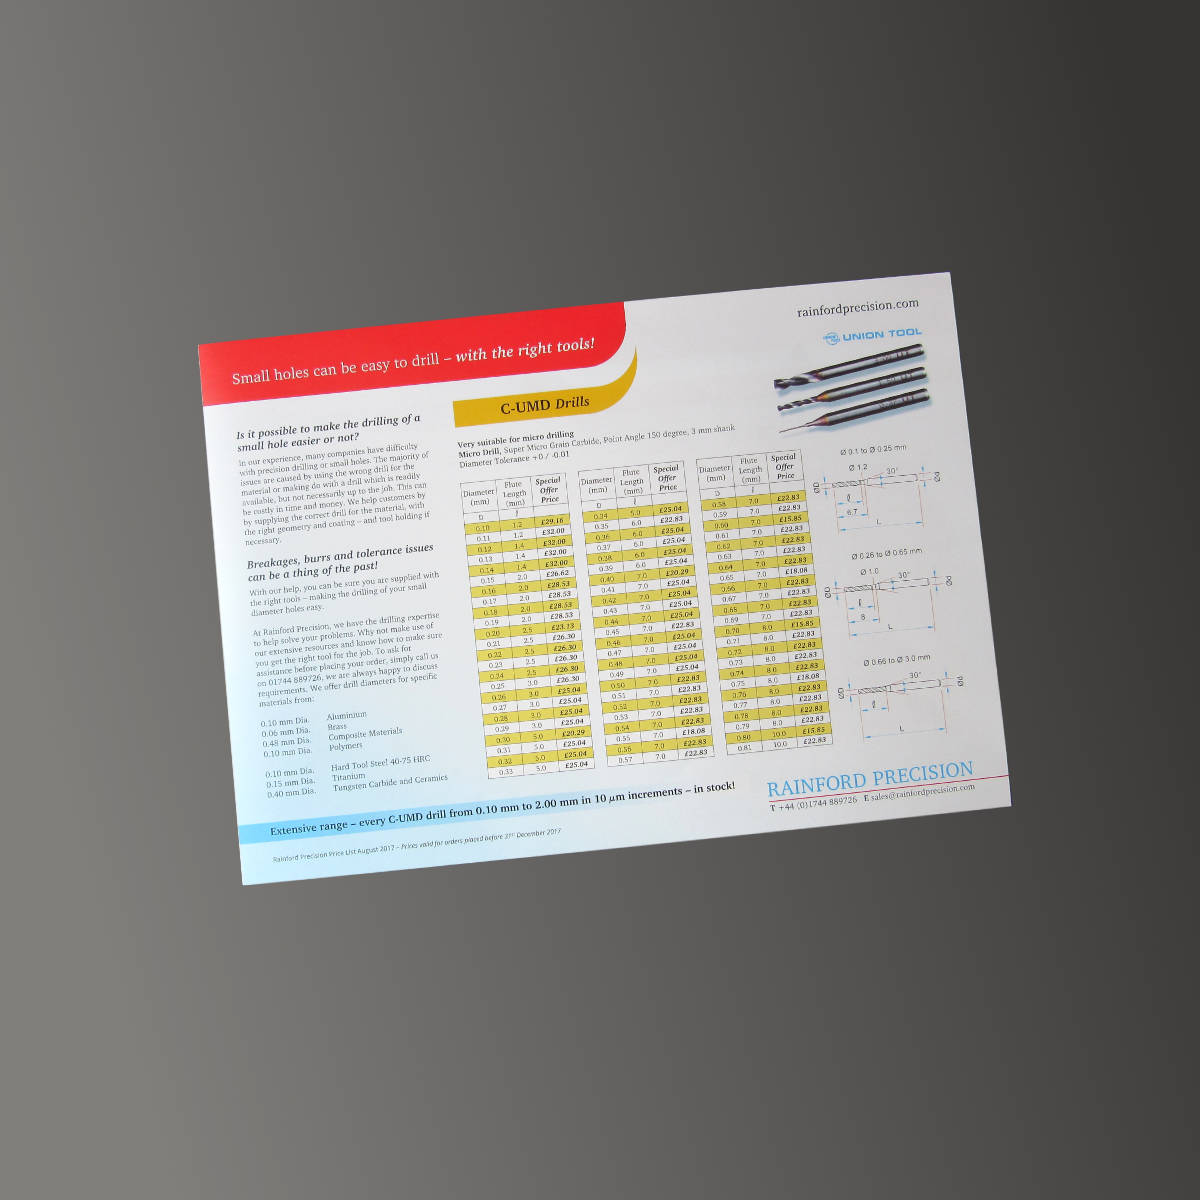 Rainford Precision Drills Price List 2018, print design by Orangebox